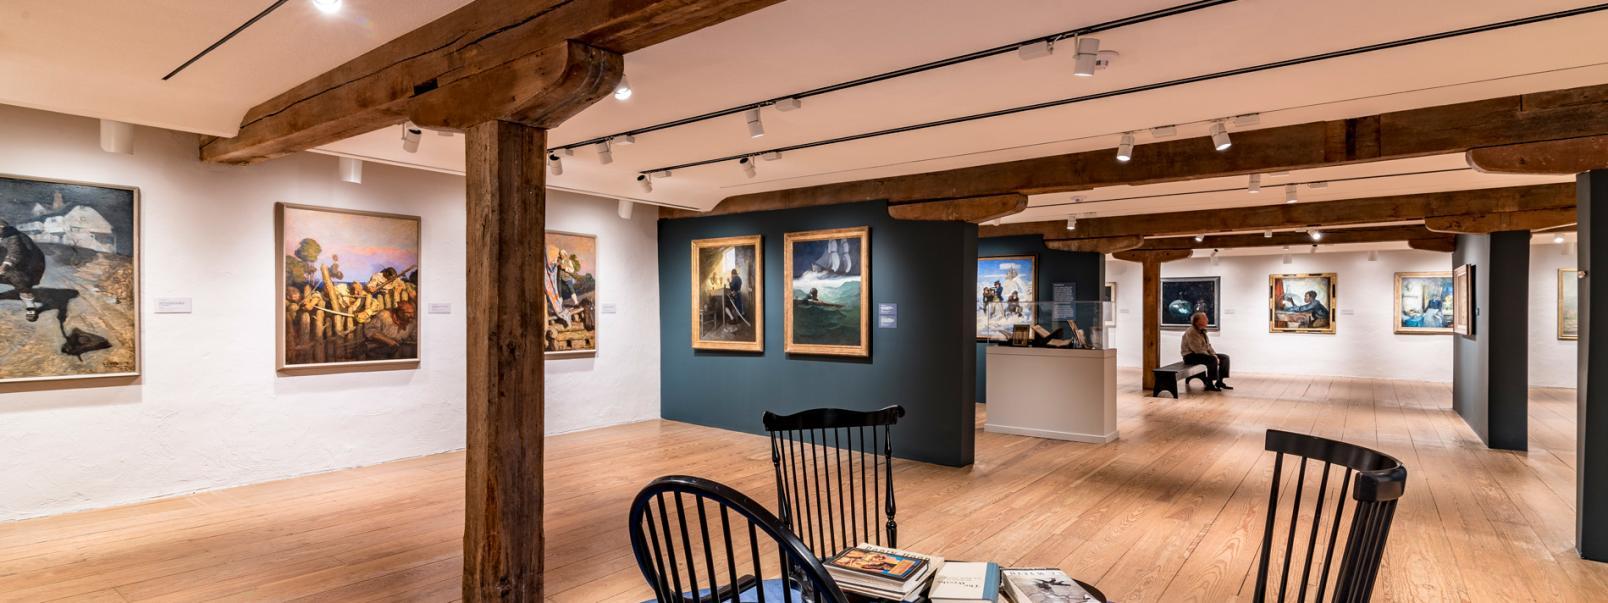 Brandywine River Museum of Art Unveils